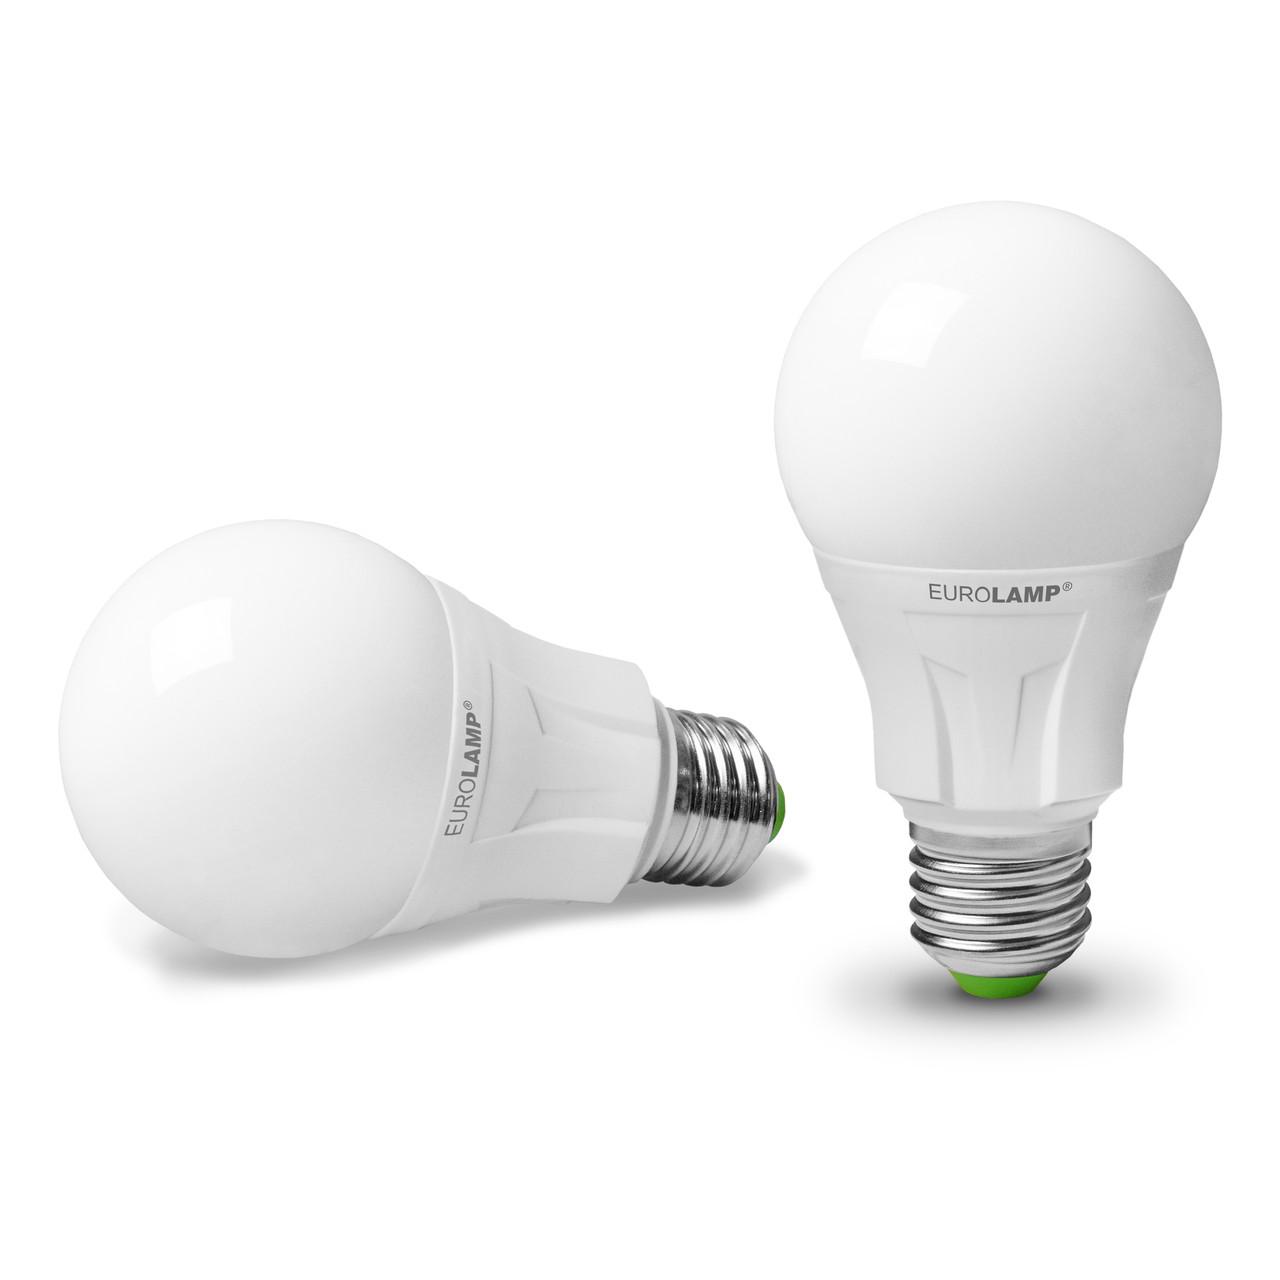 Лампочка LED Turbo Eurolamp A60 10W E27 4000K